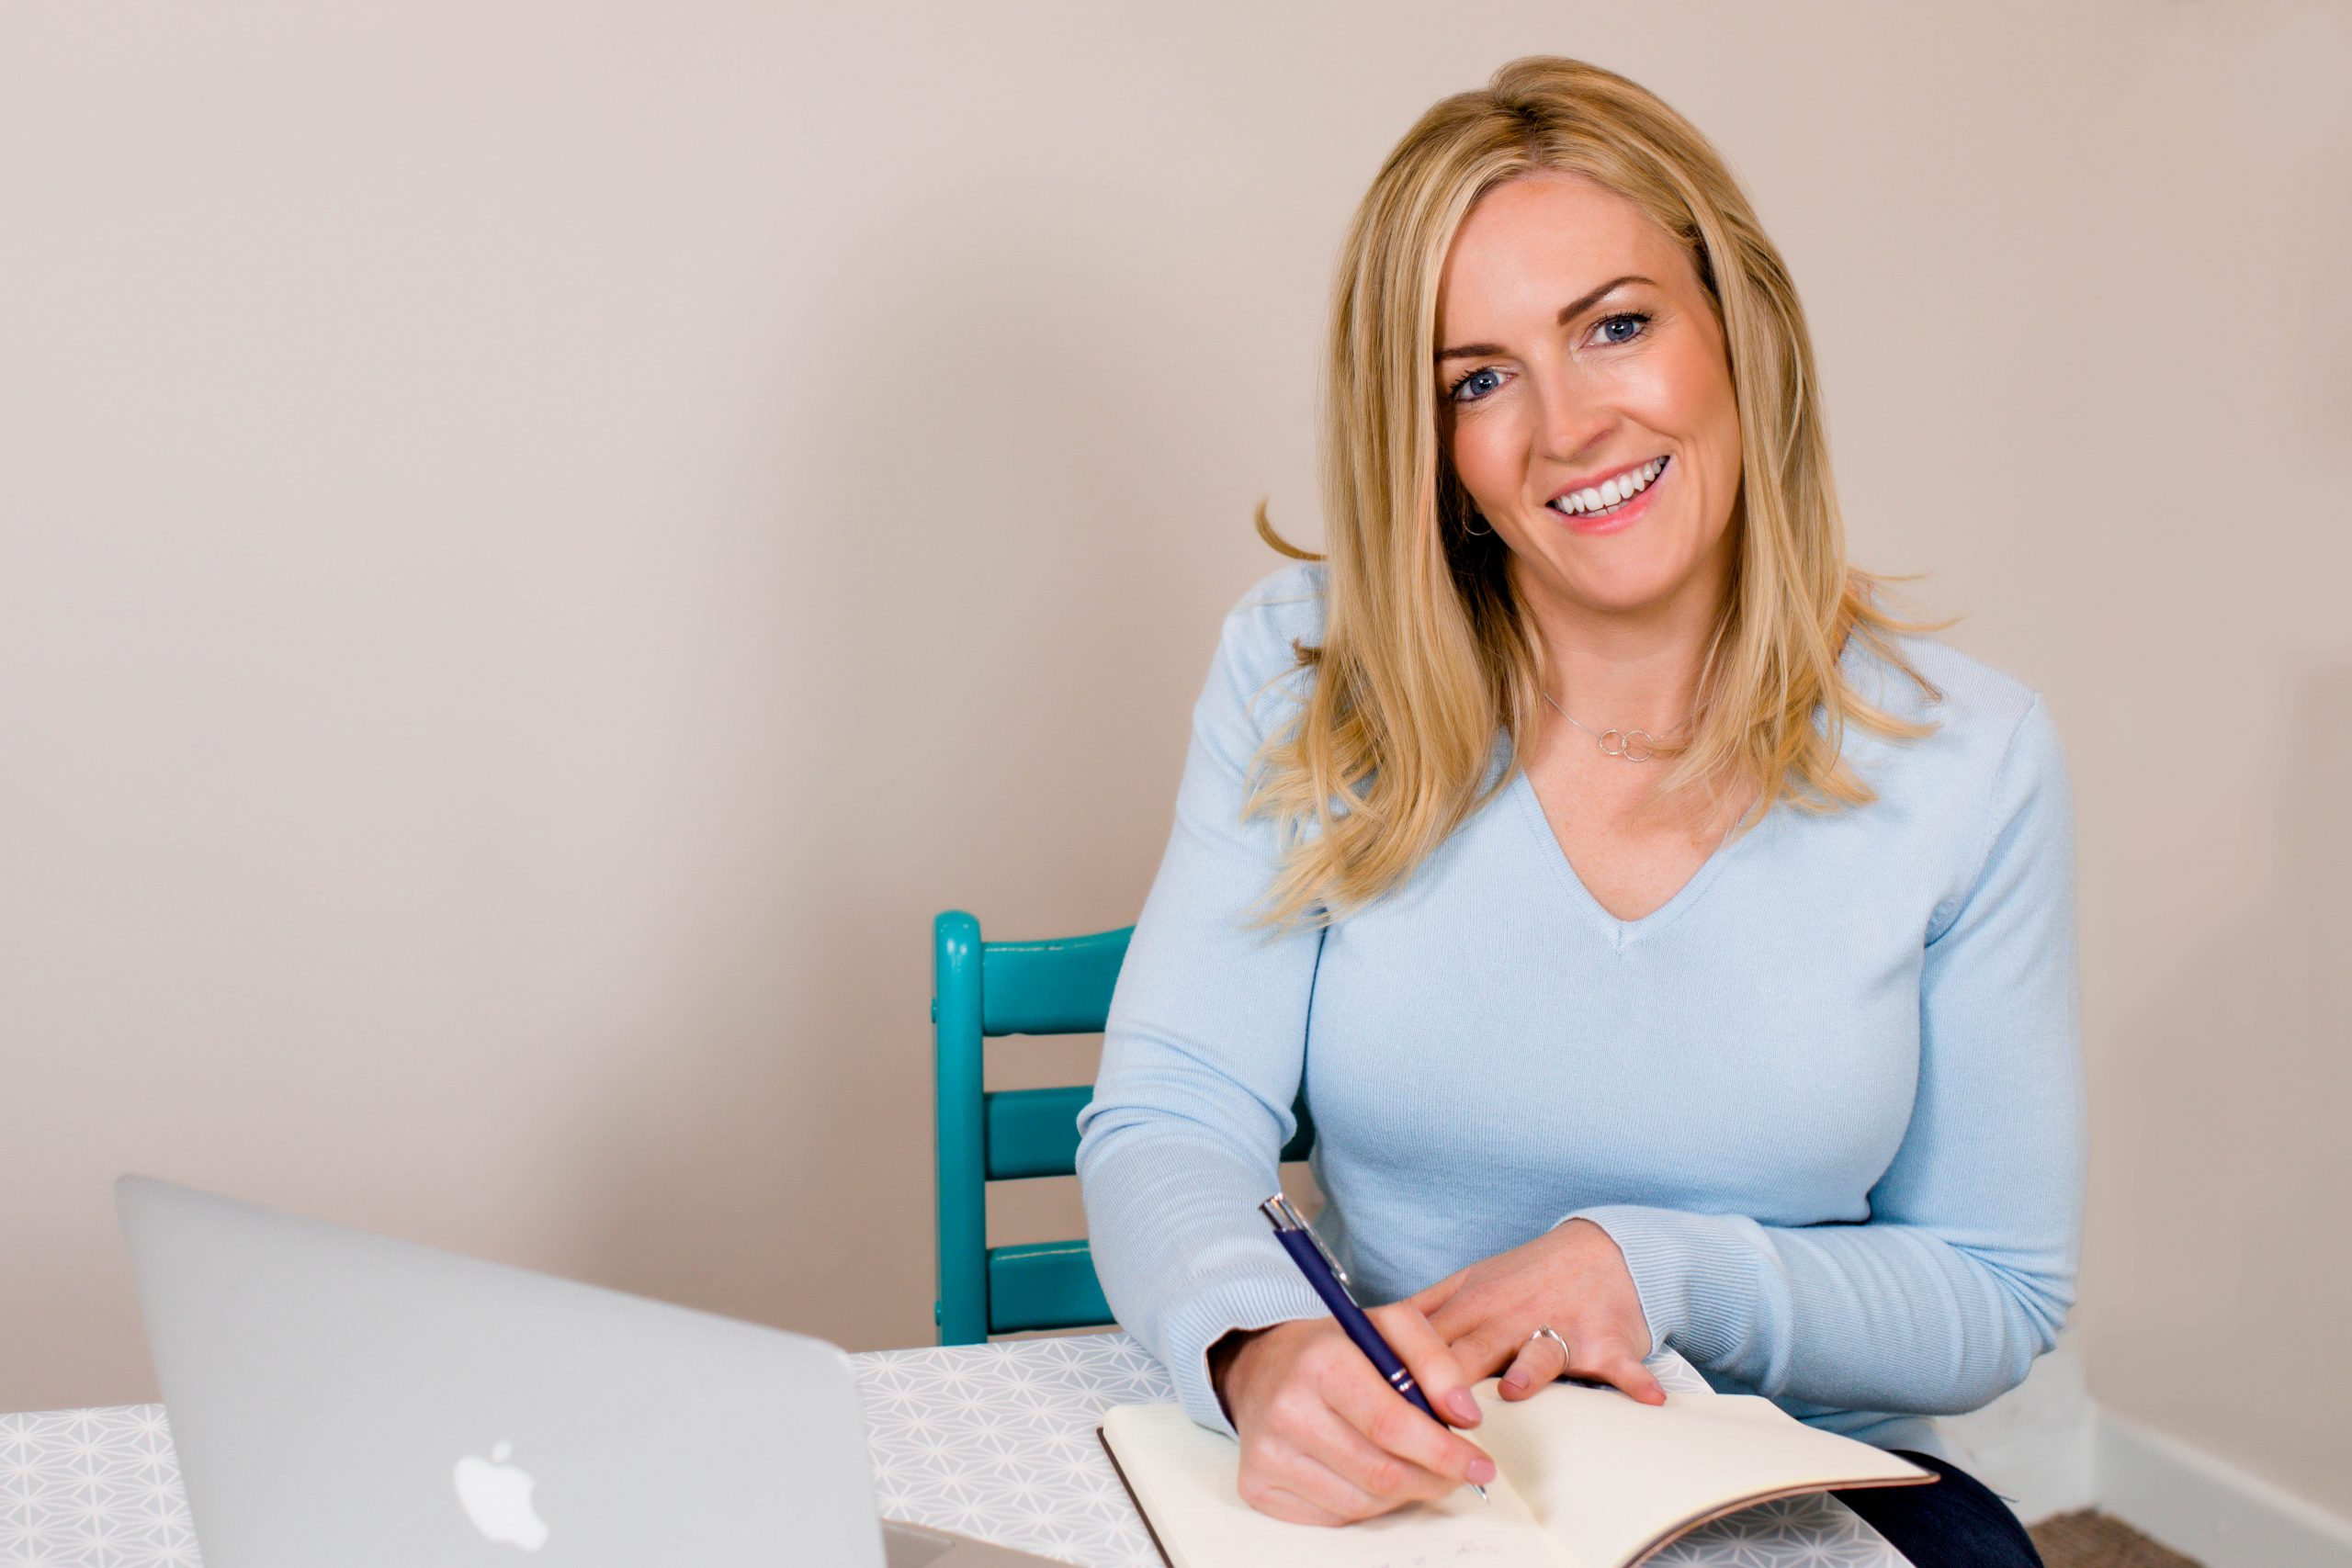 female entrepreneur writing in notebook